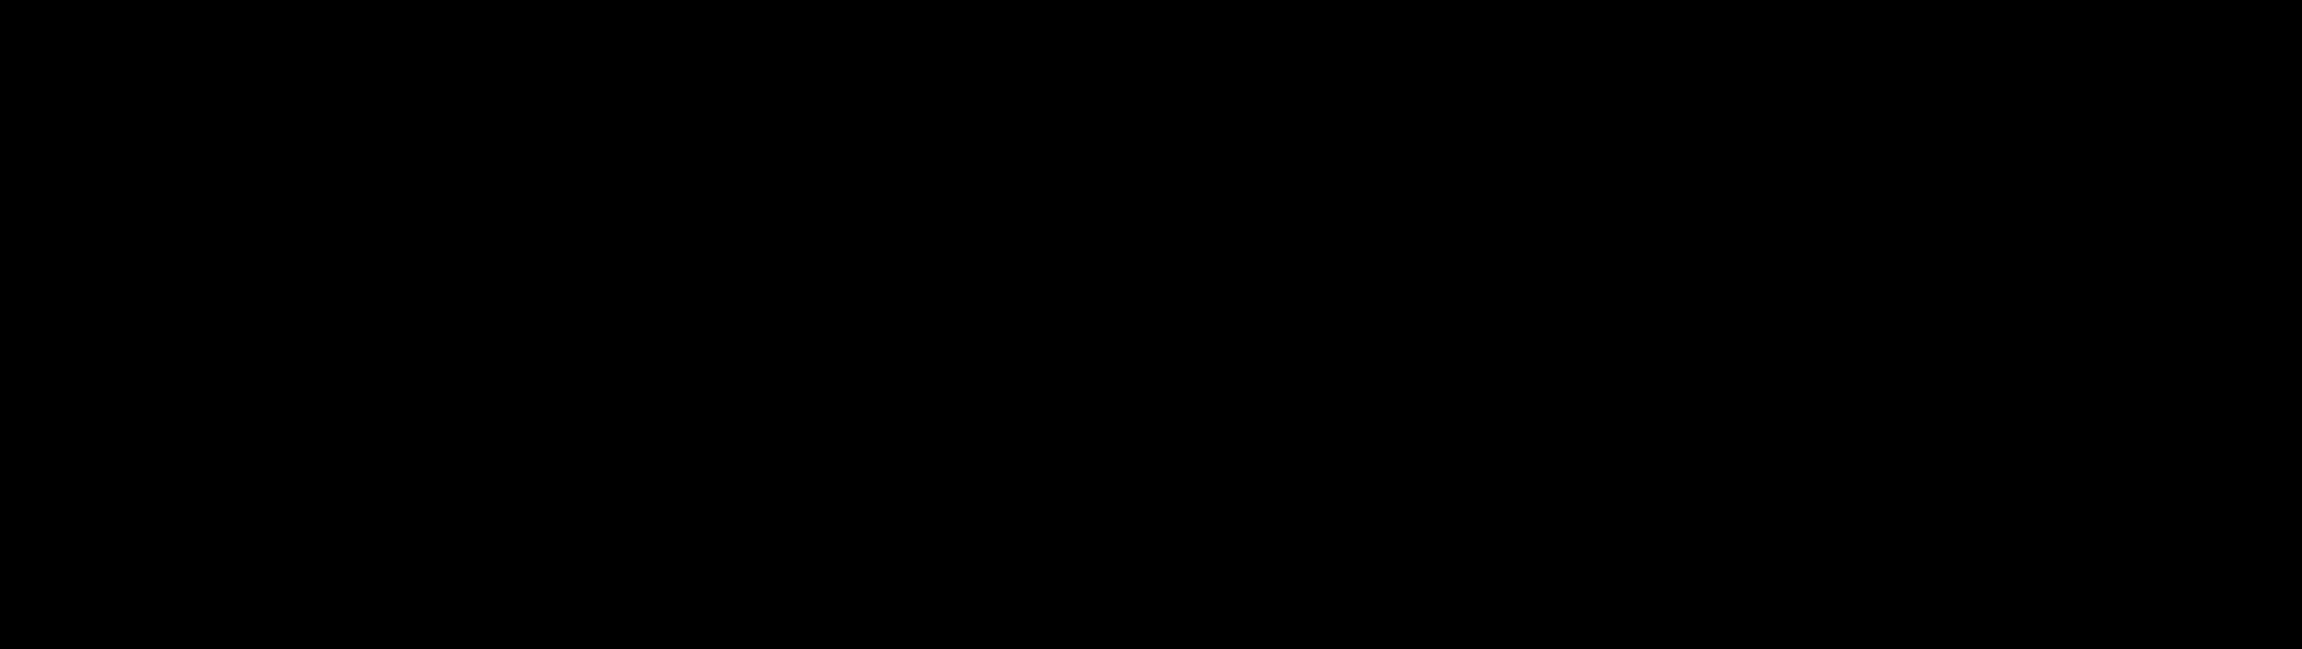 Aripiprazole N4-oxide